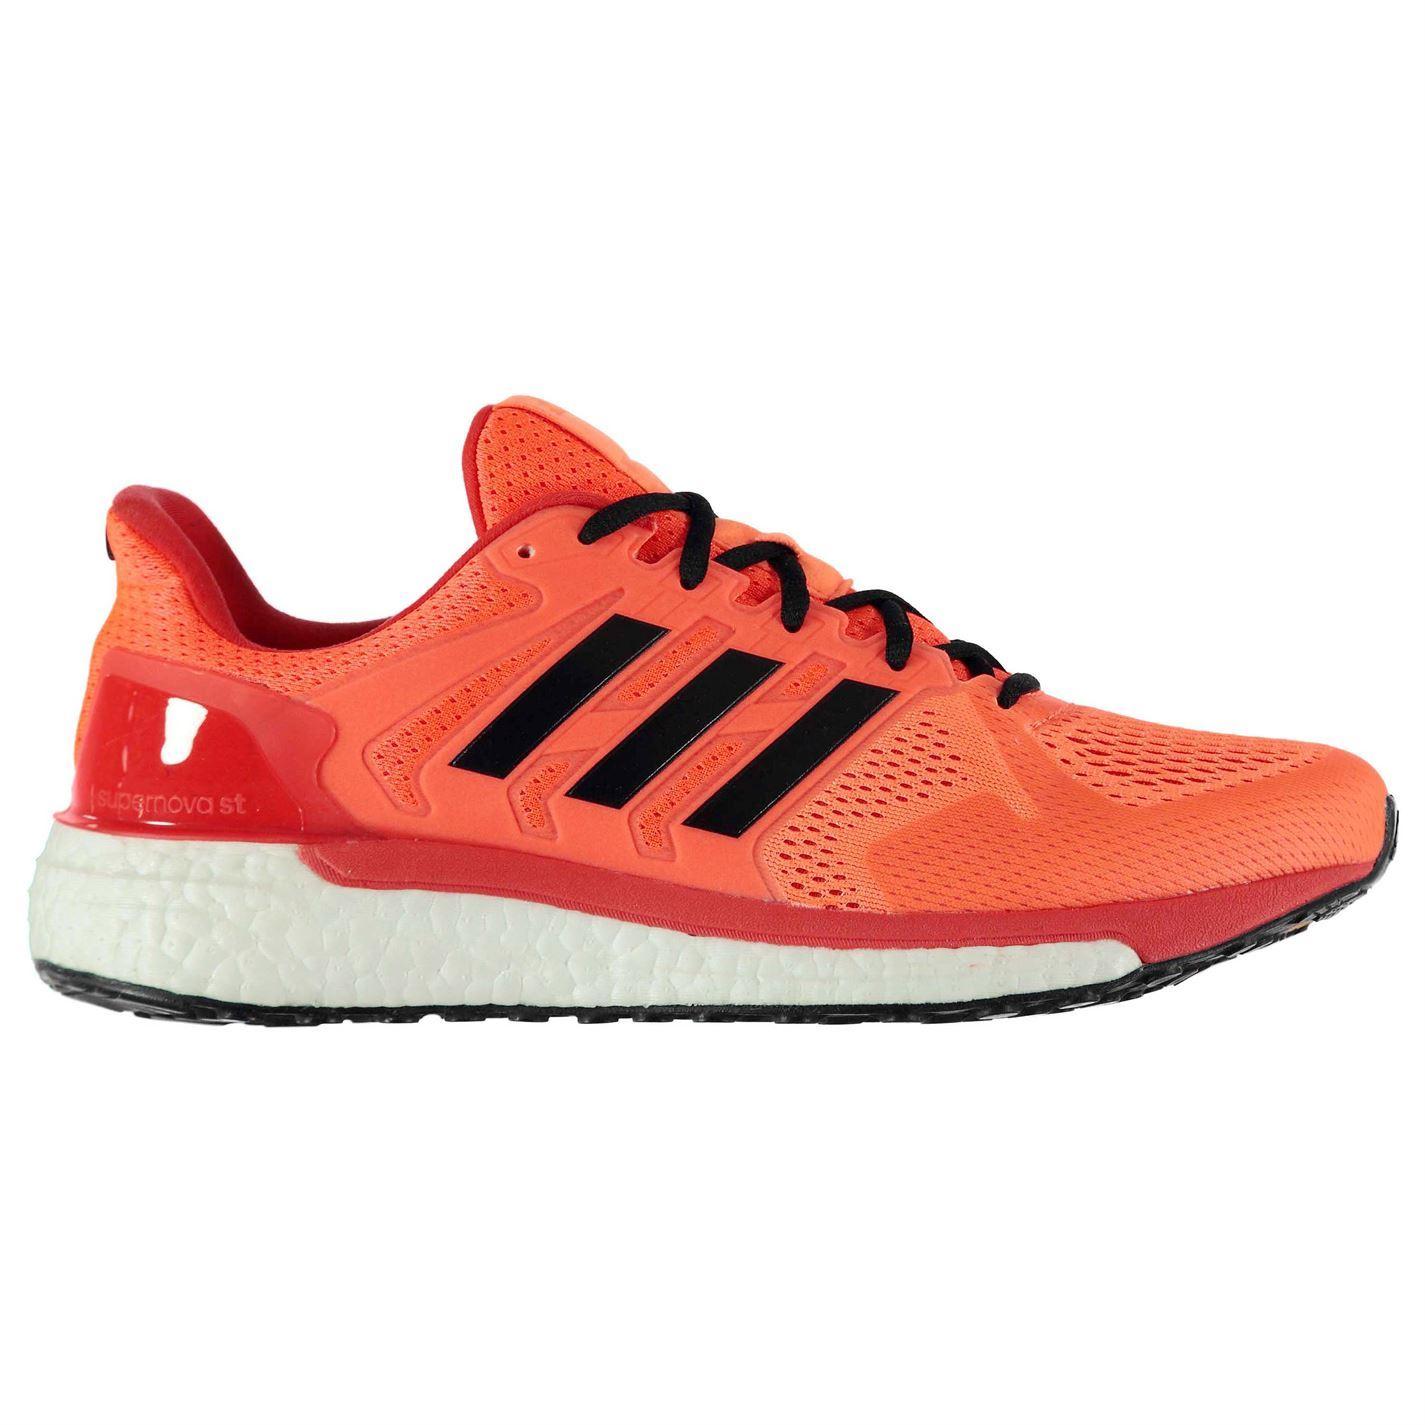 f166bea9168517 adidas Supernova ST Running Shoes Road Mens